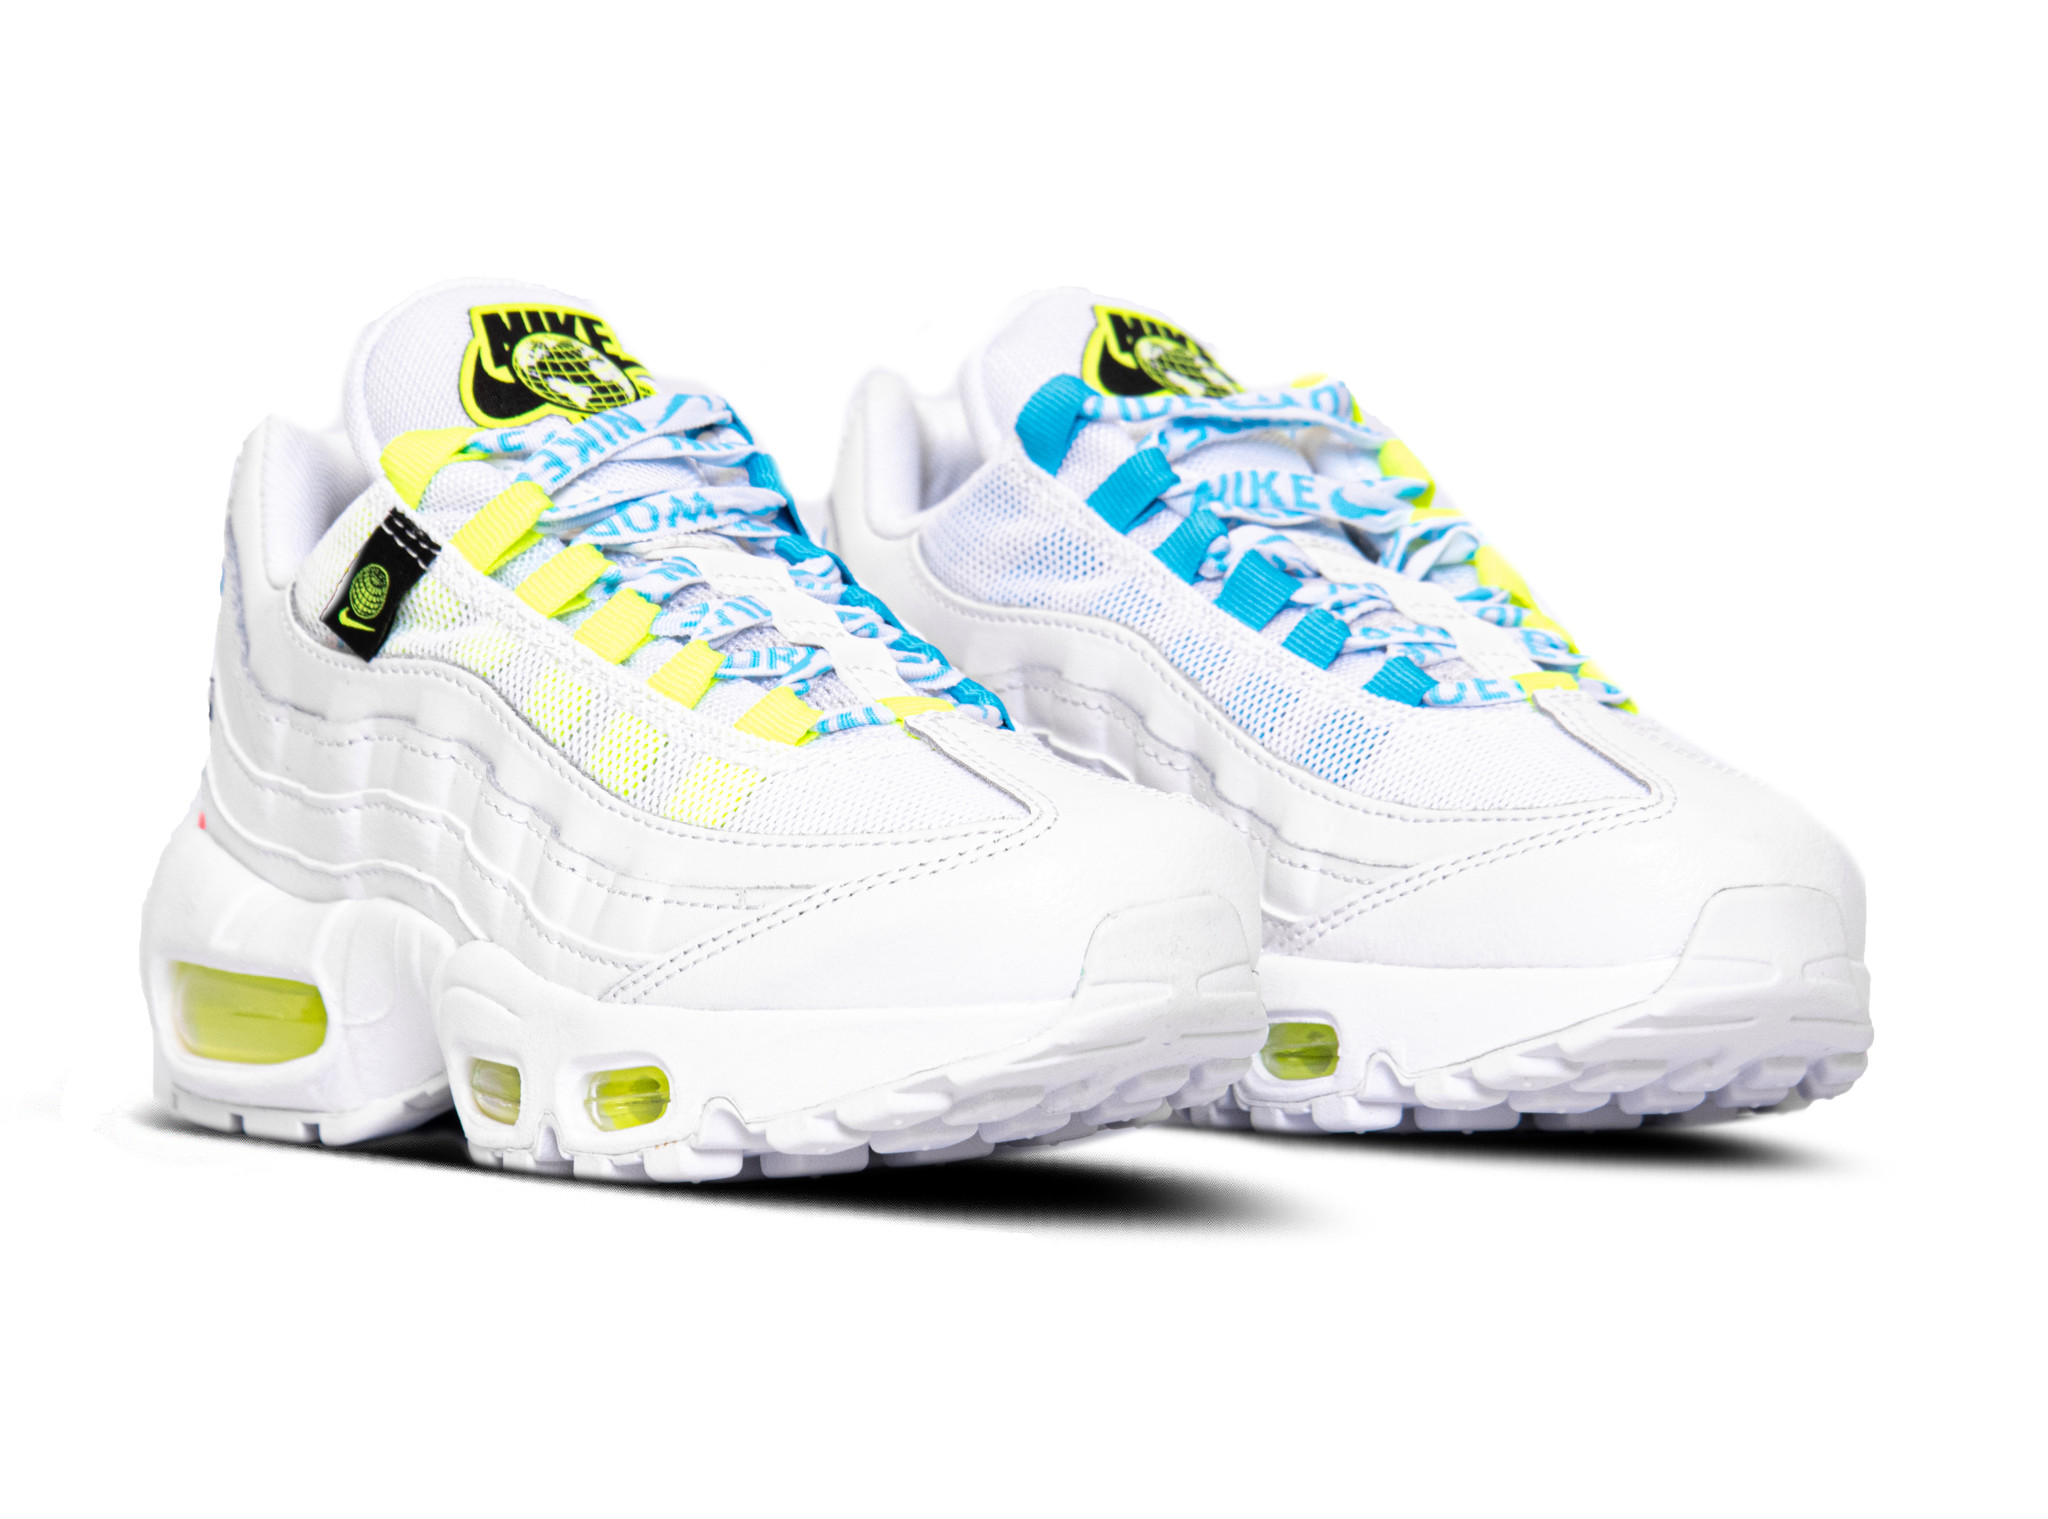 hotel Investigación En otras palabras  Nike W Air Max 95 SE White Volt Blue Fury CV9030 100 - Bruut Sneakers &  Clothing Store